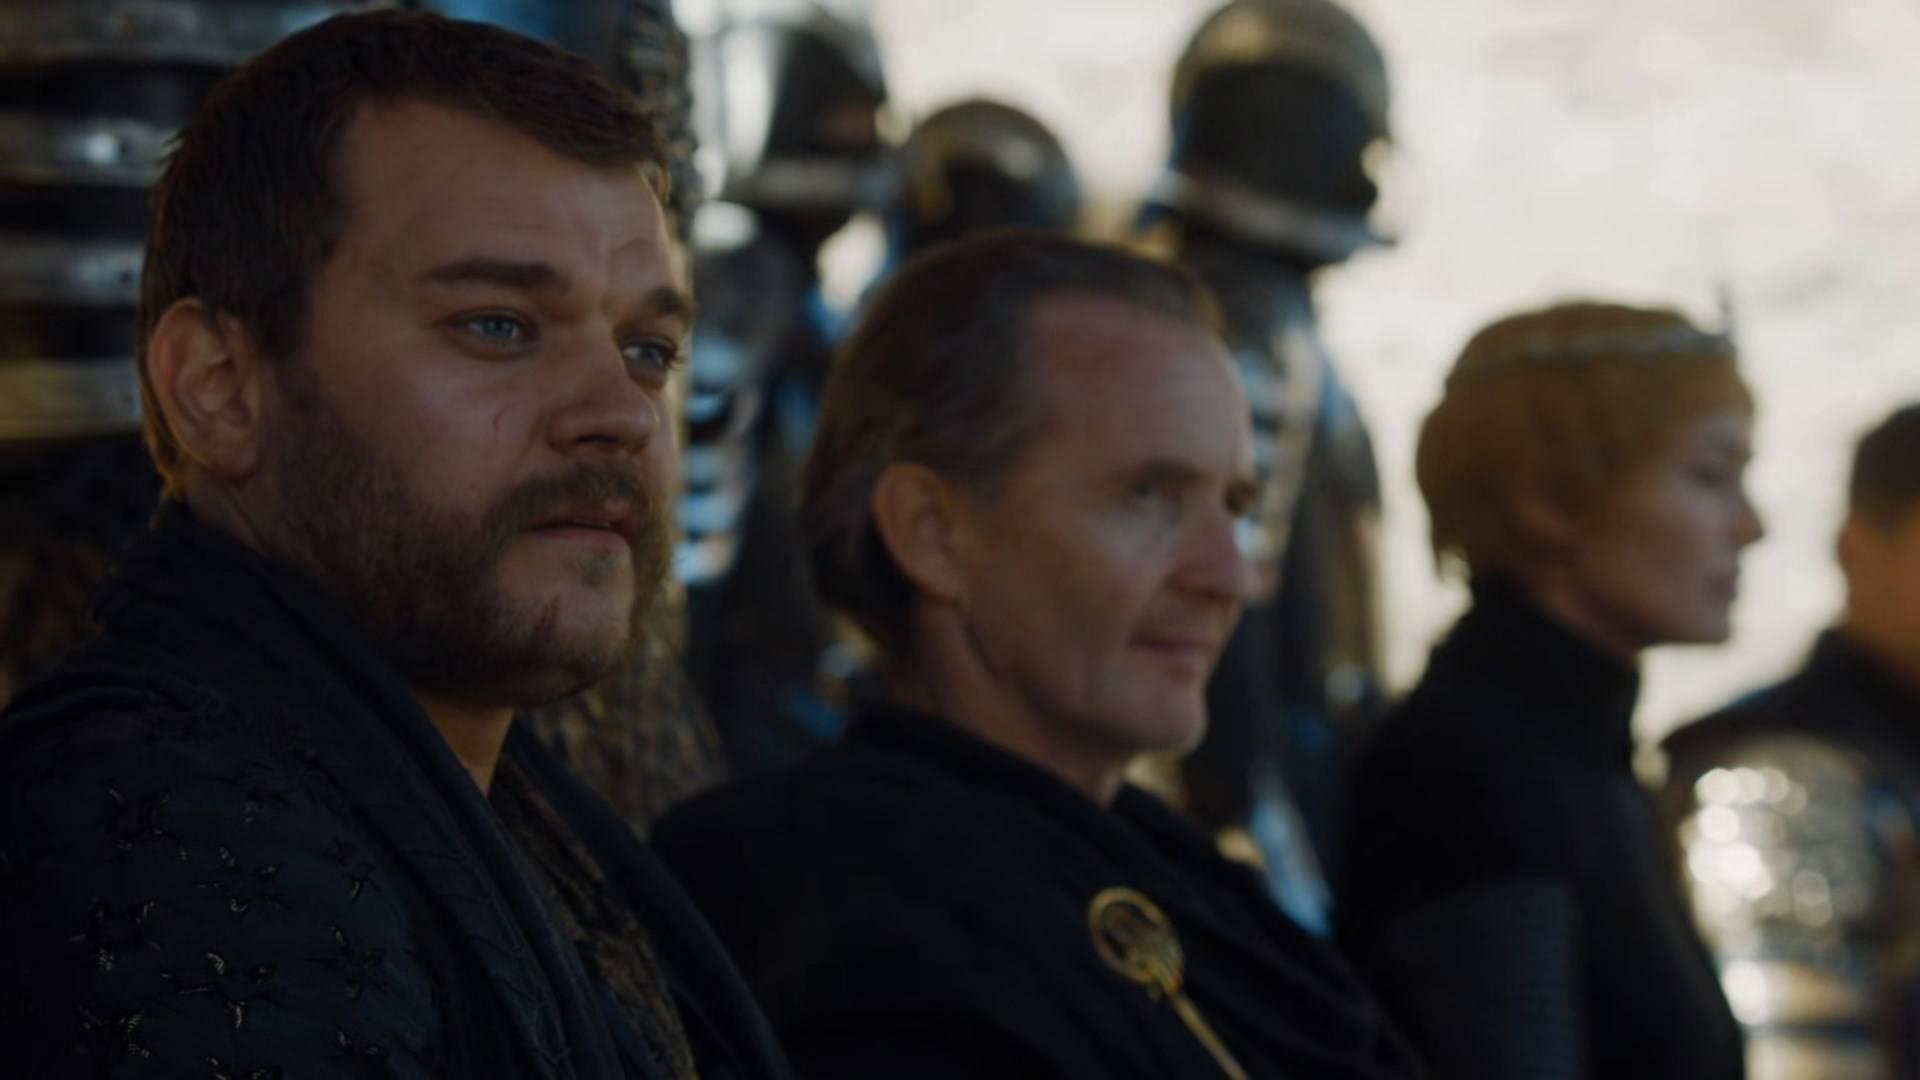 Game.of.Thrones.S07E07.720p.HDTV.X264-UAV English Subtitle